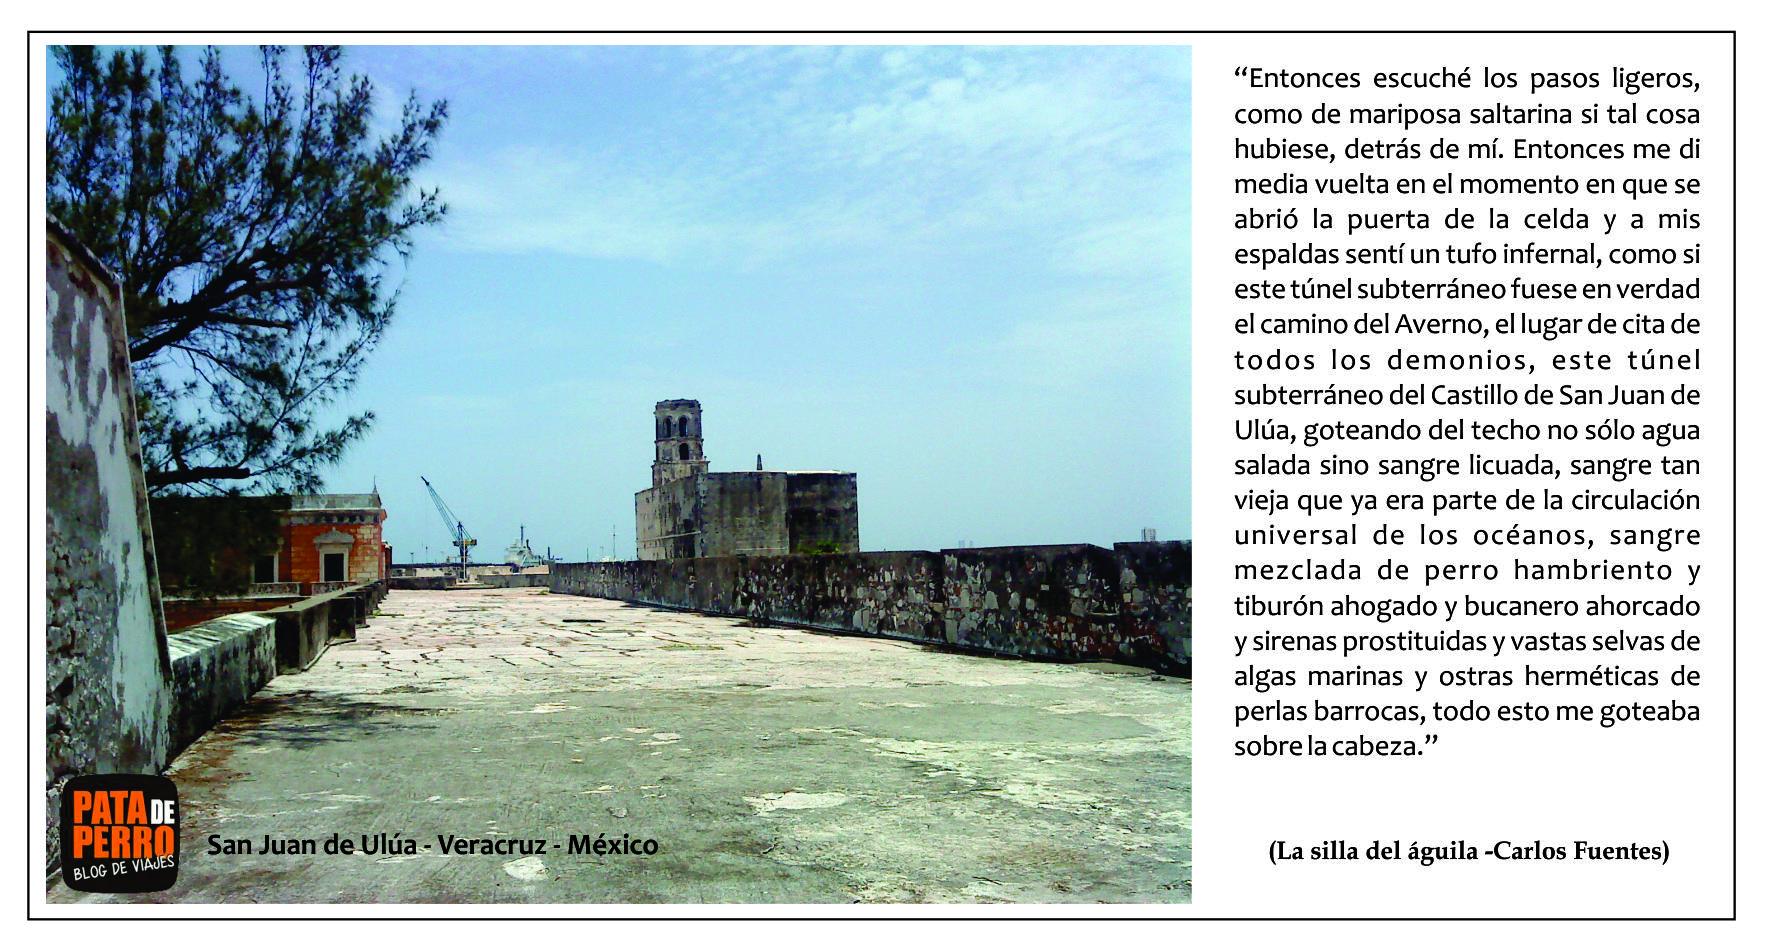 postal01 San Juan de Ulua Veracruz Mexico